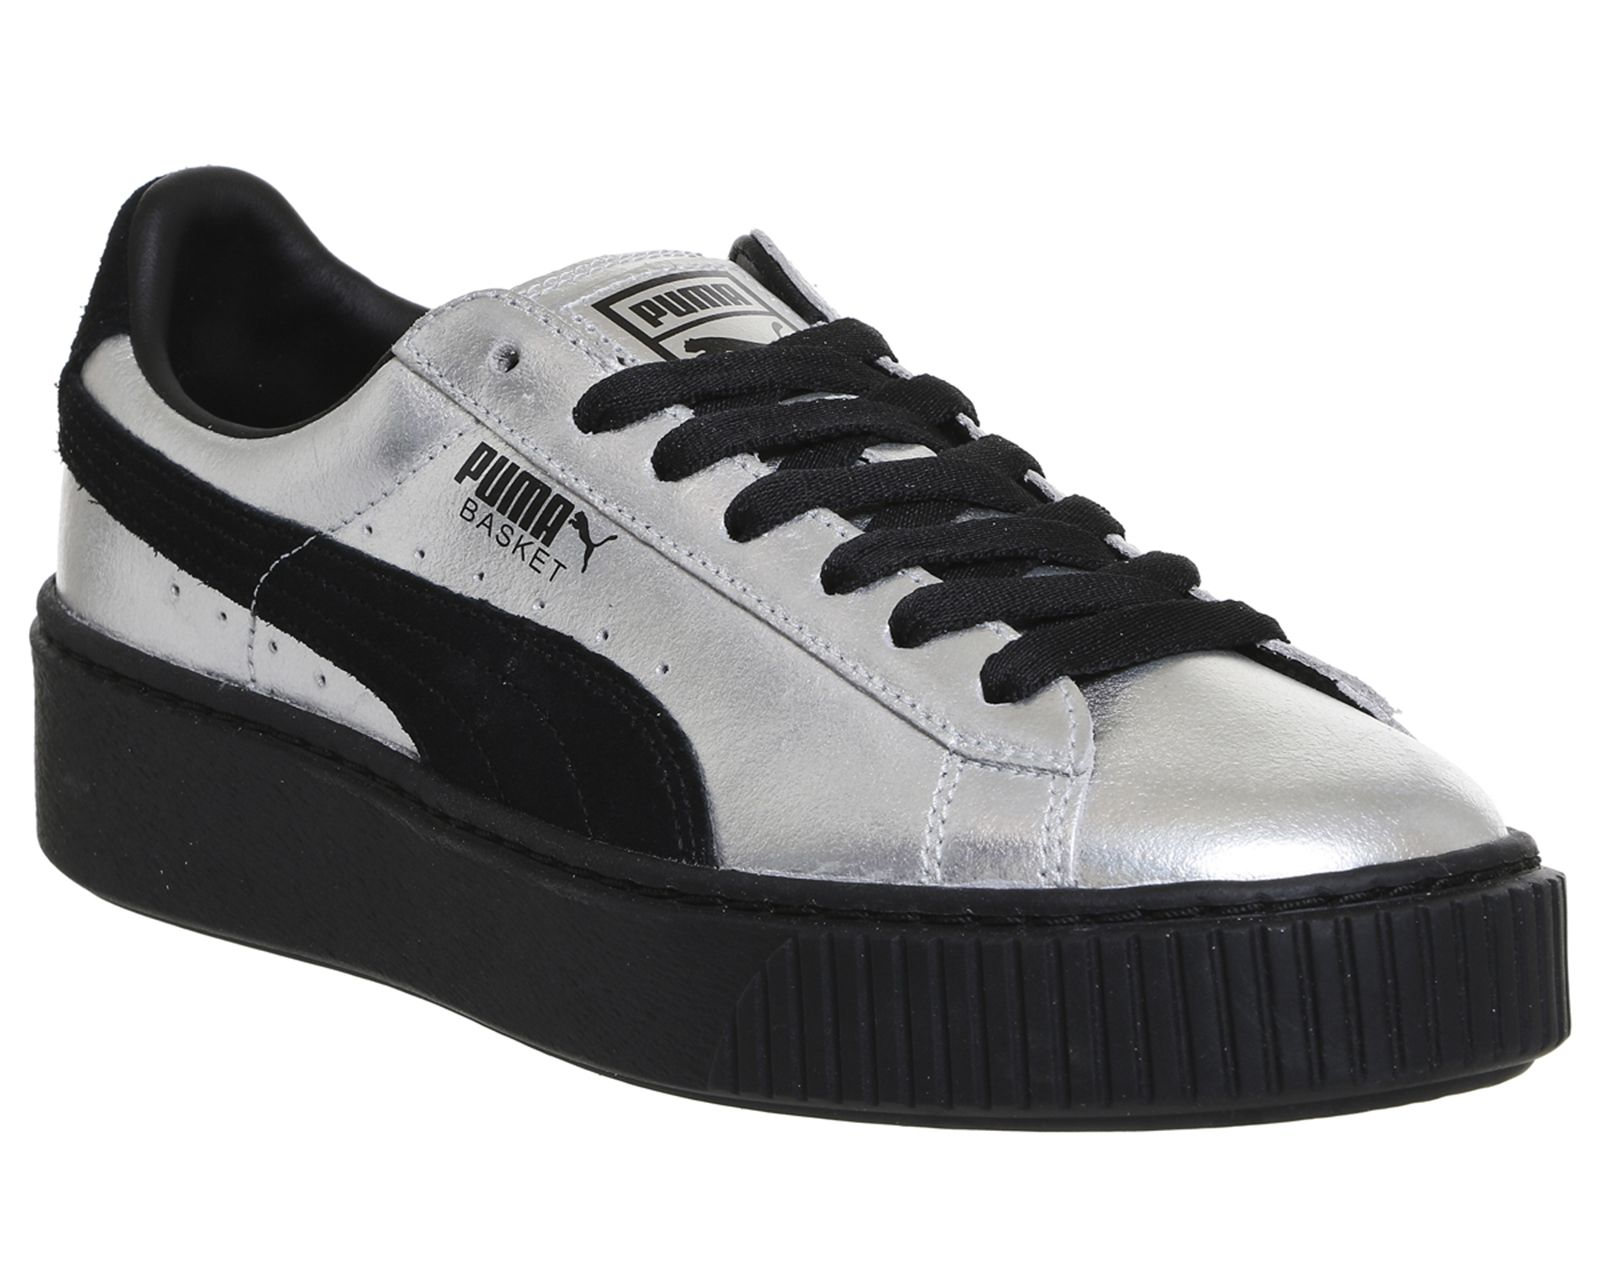 fabdf1cd87 Basket Platform | TENISICEEEEEE | Shoe boots, Office shoes, Adidas shoes